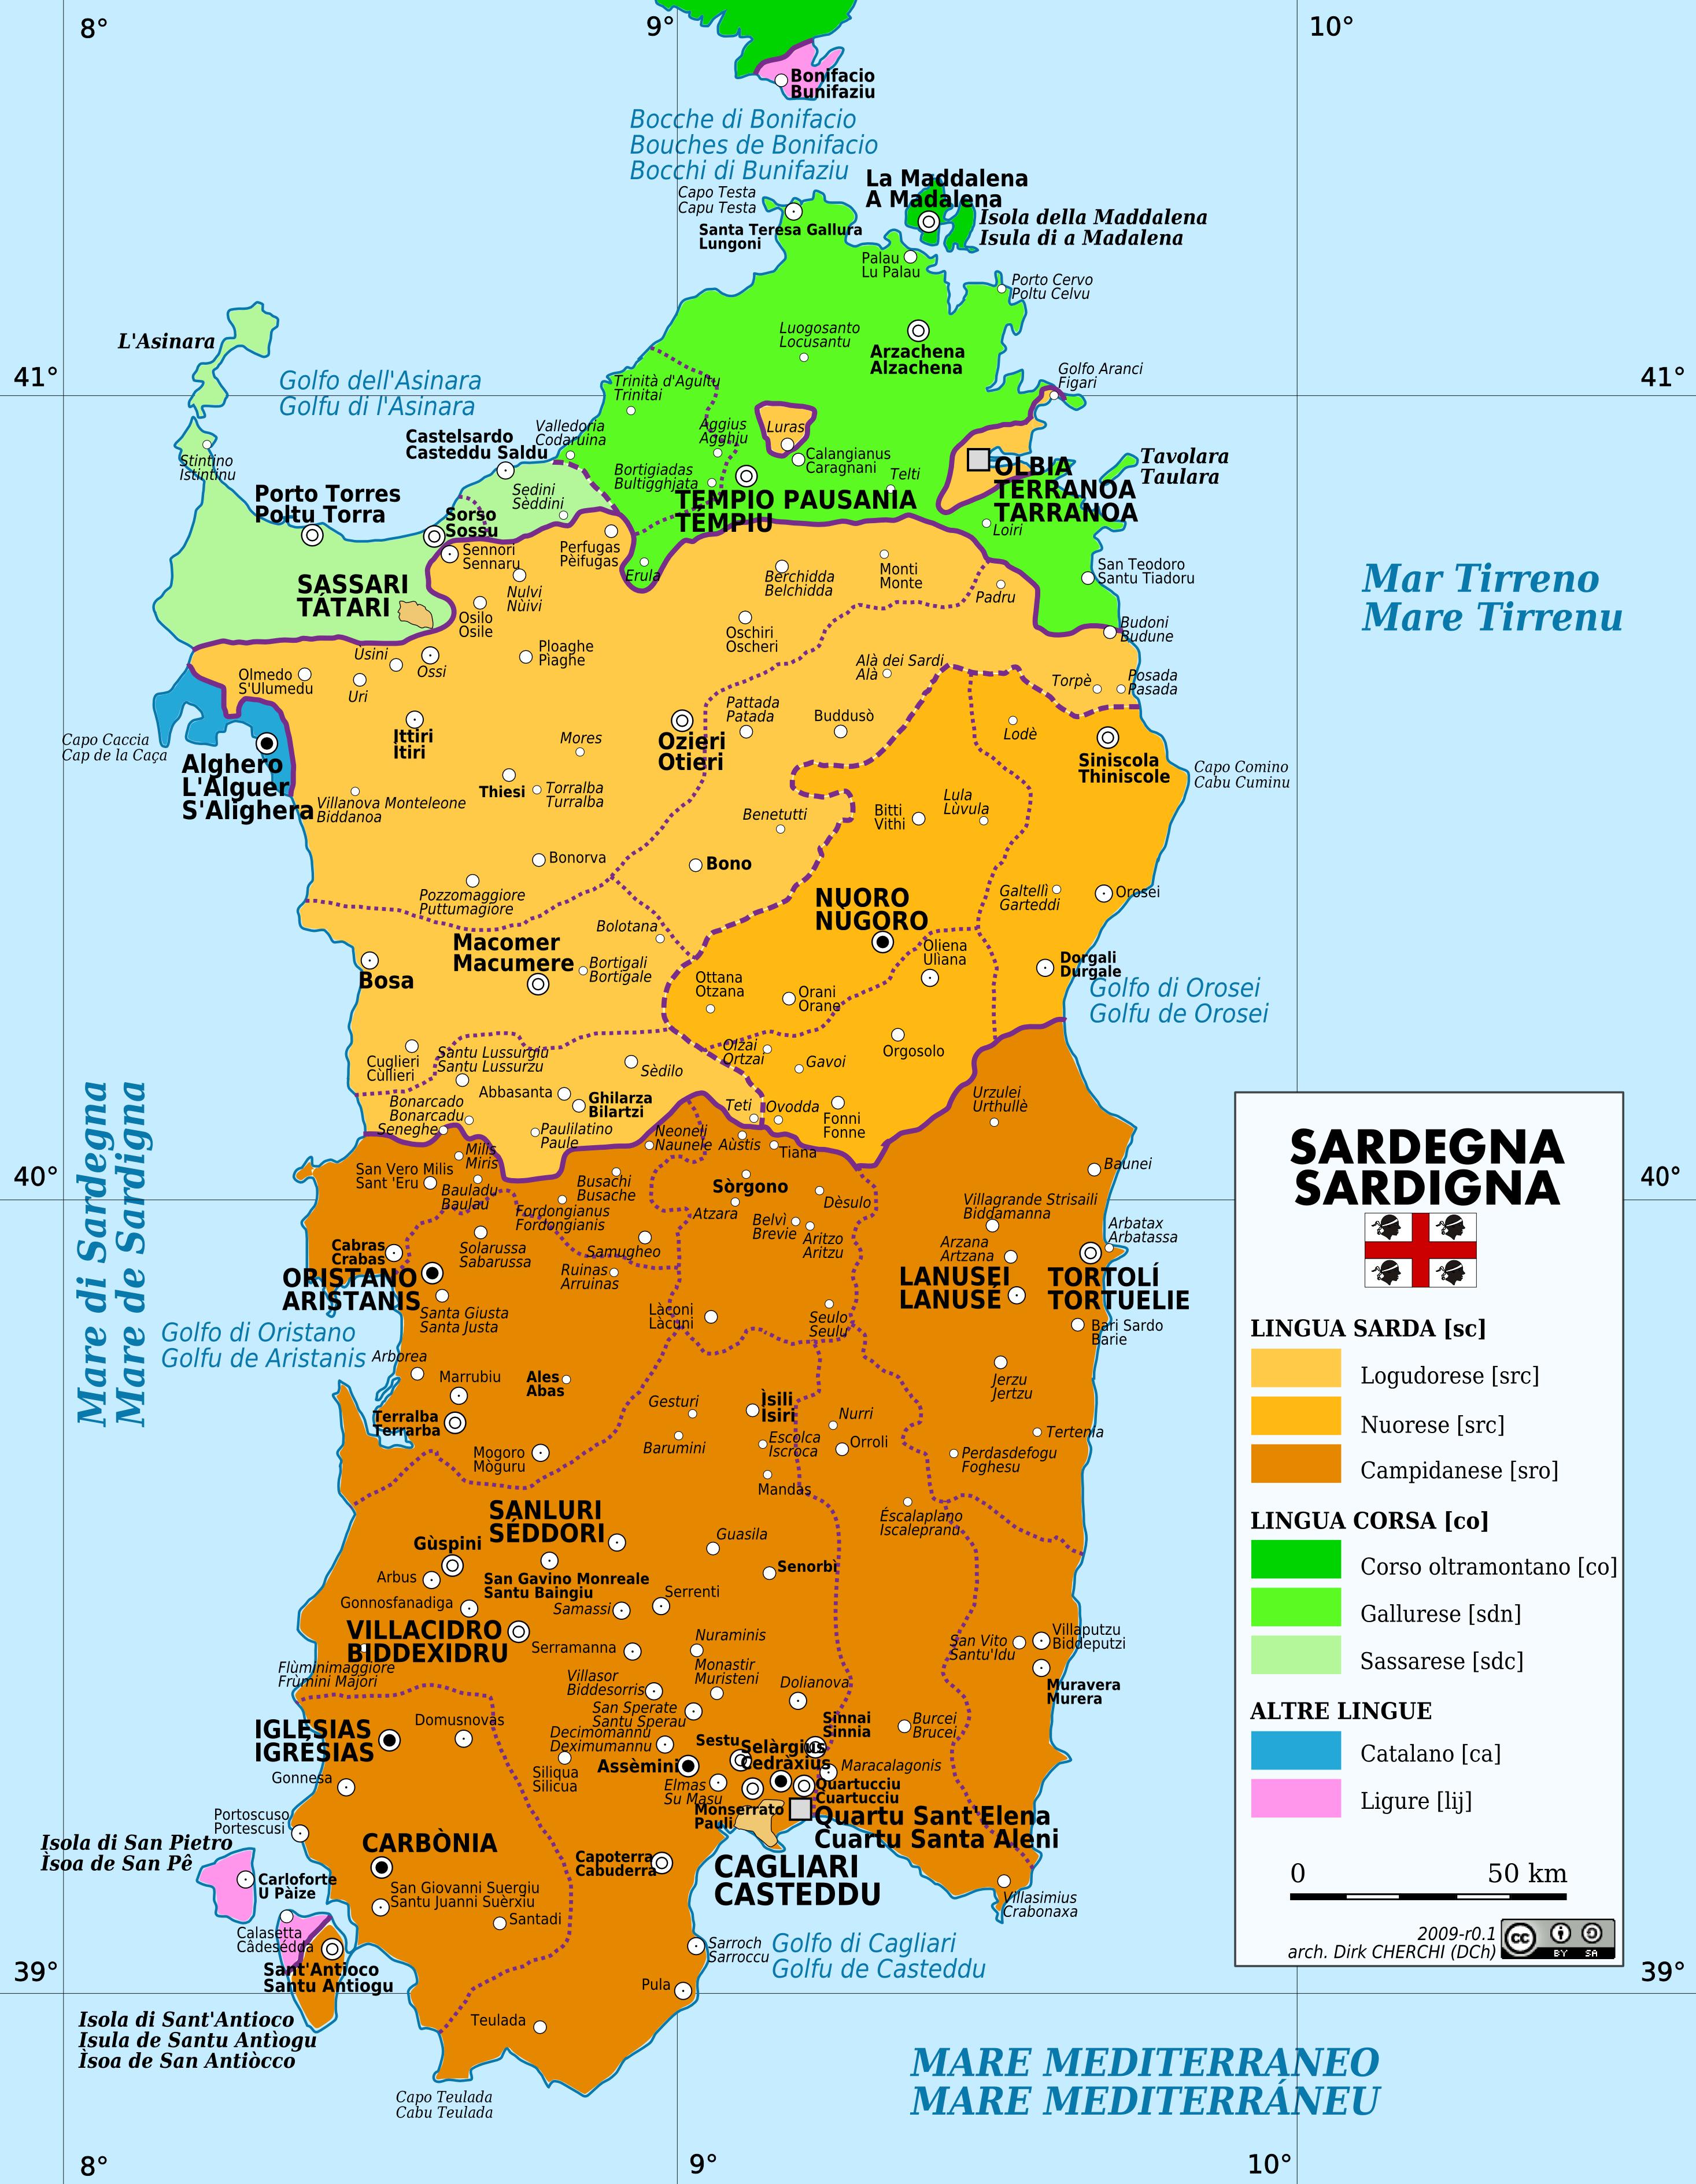 Sardinia Language Map Sardegna Pinterest